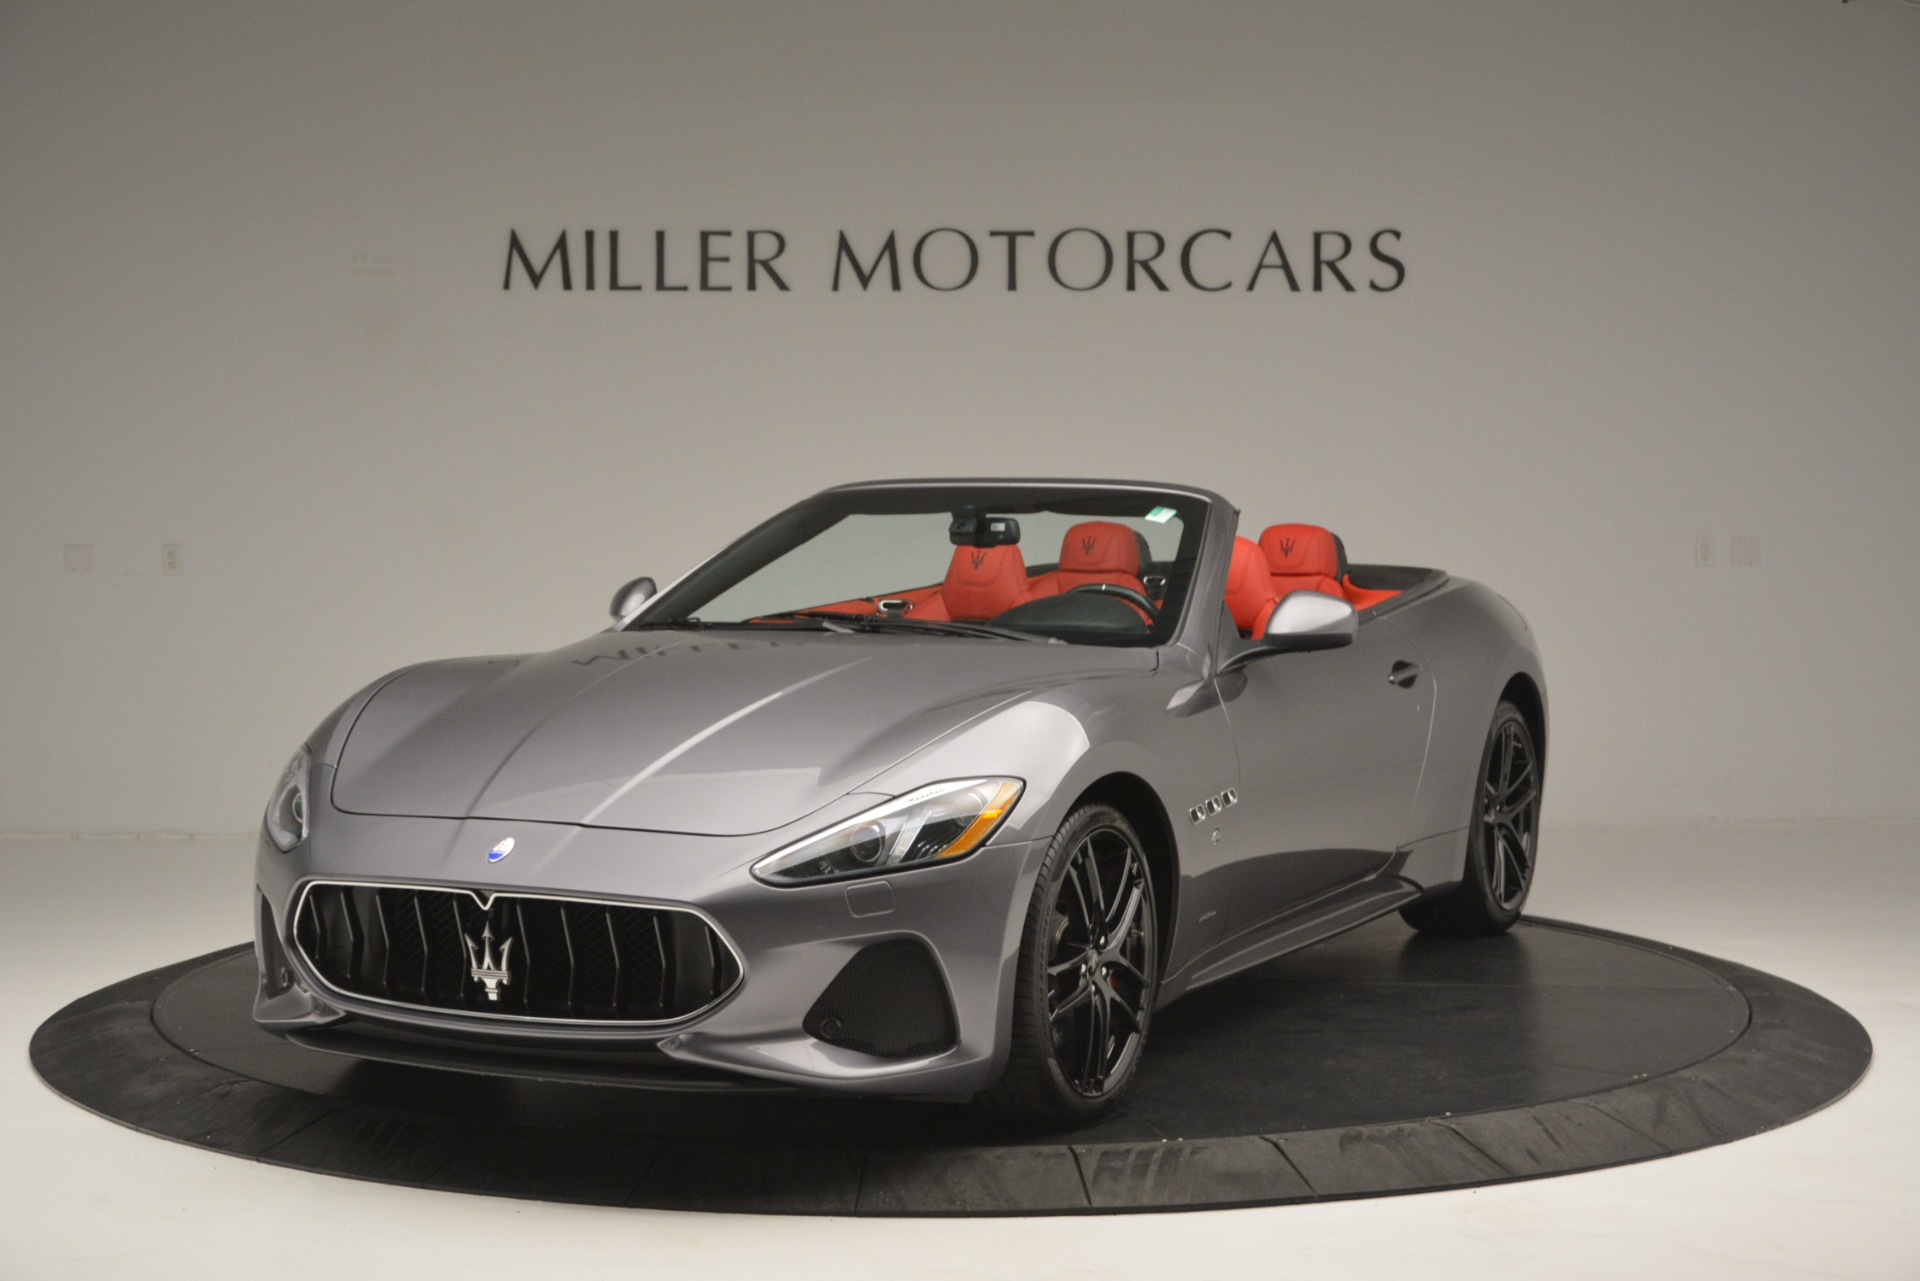 Used 2018 Maserati GranTurismo Sport for sale $102,900 at Bentley Greenwich in Greenwich CT 06830 1